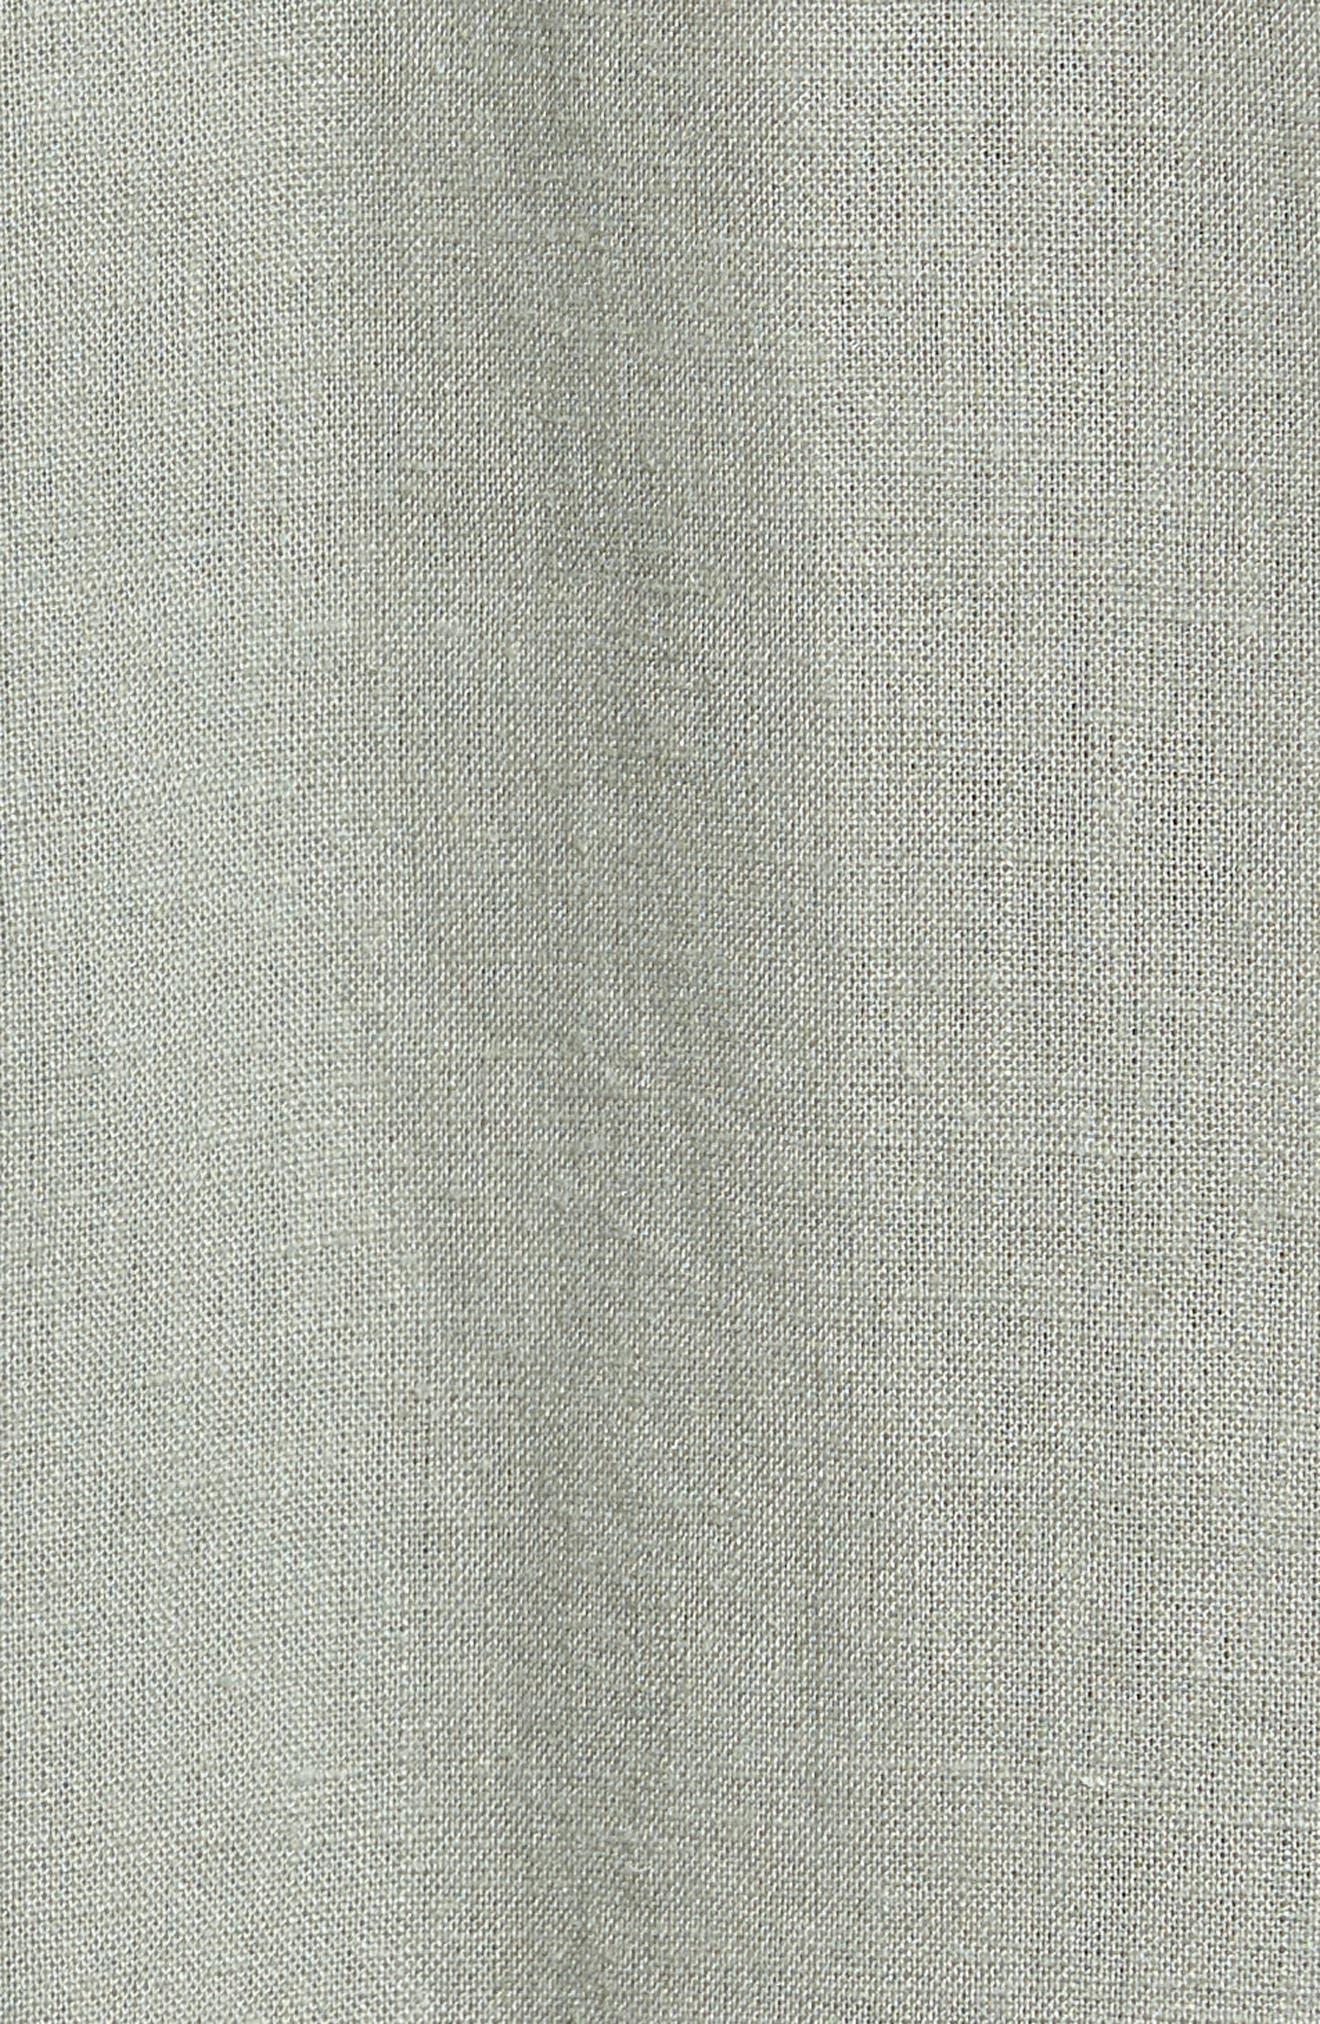 Kona Embroidered Shirt,                             Alternate thumbnail 5, color,                             Sage/ Inca Embroidery